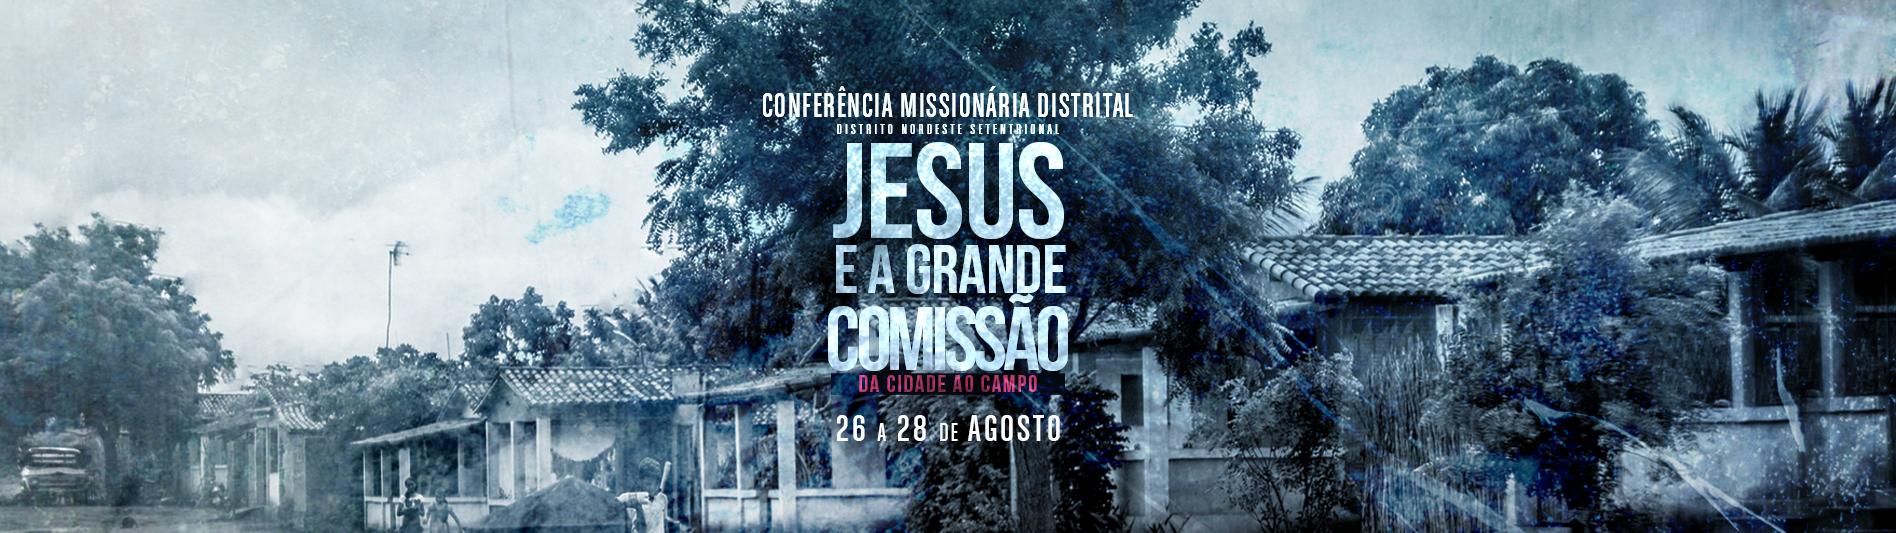 Conferência Missionária Distrital